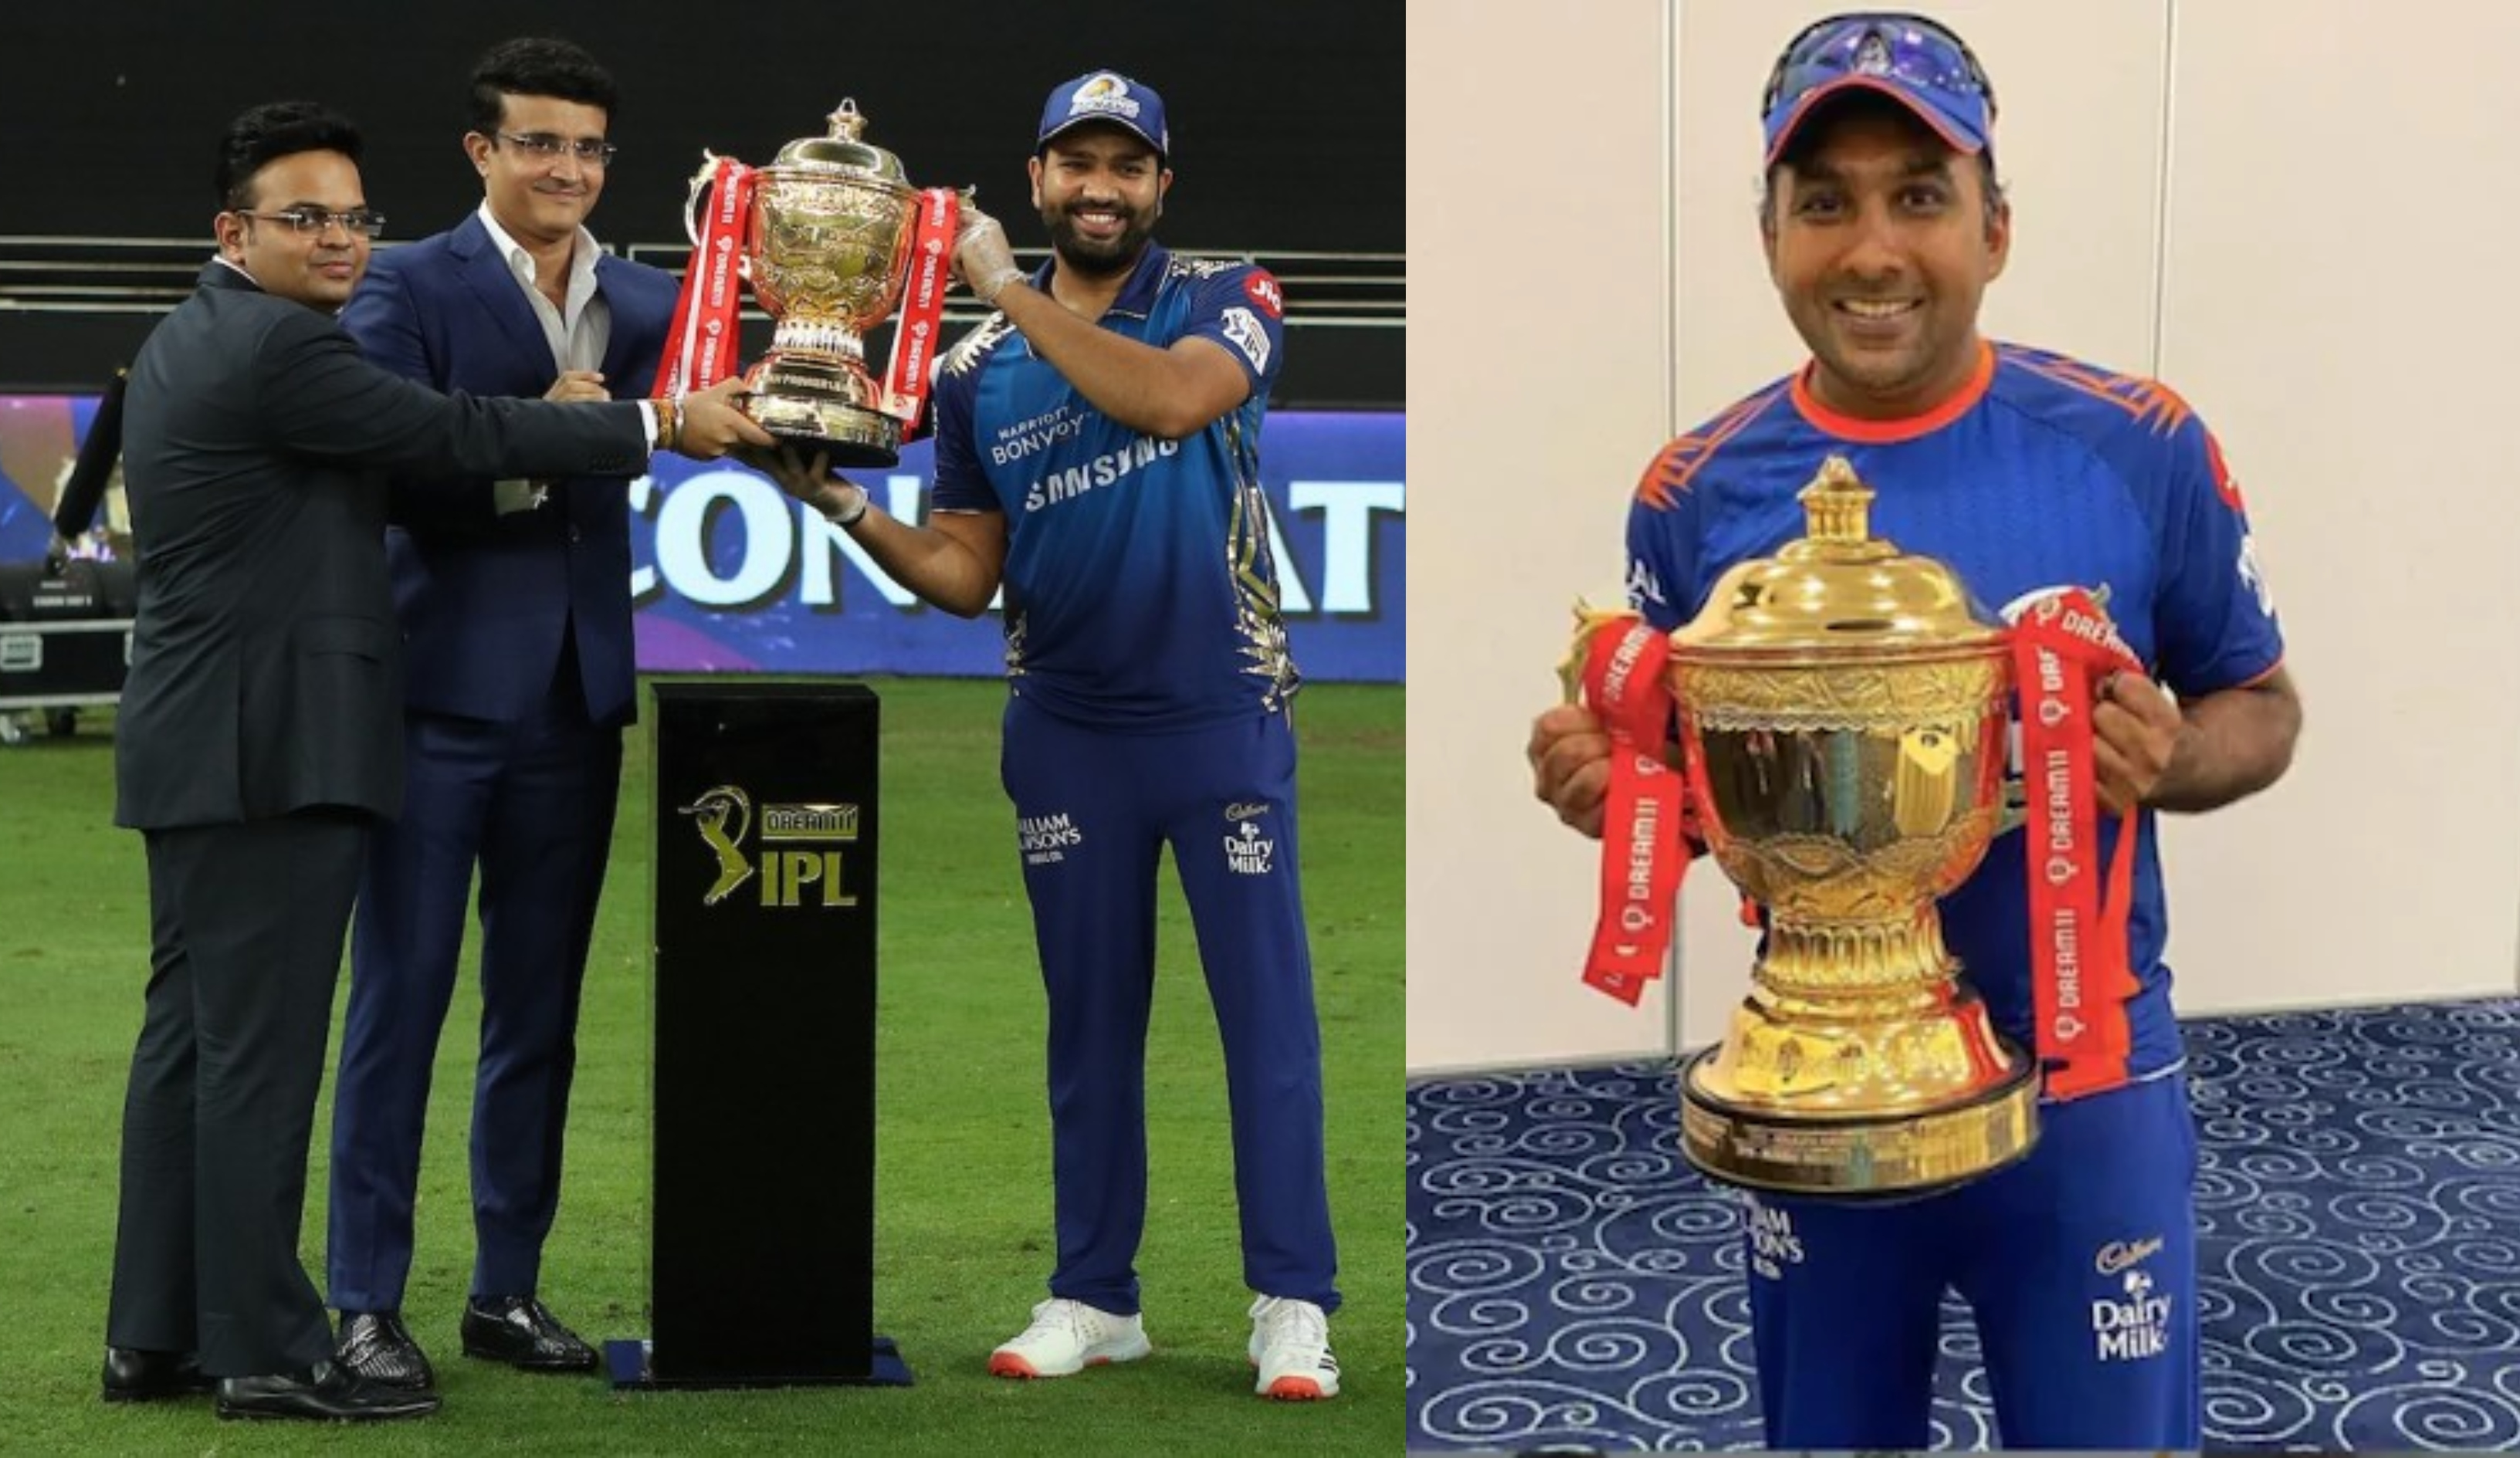 Rohit Sharma and Mahela Jayawardene with Dream11 IPL 2020 trophy | BCCI/IPL